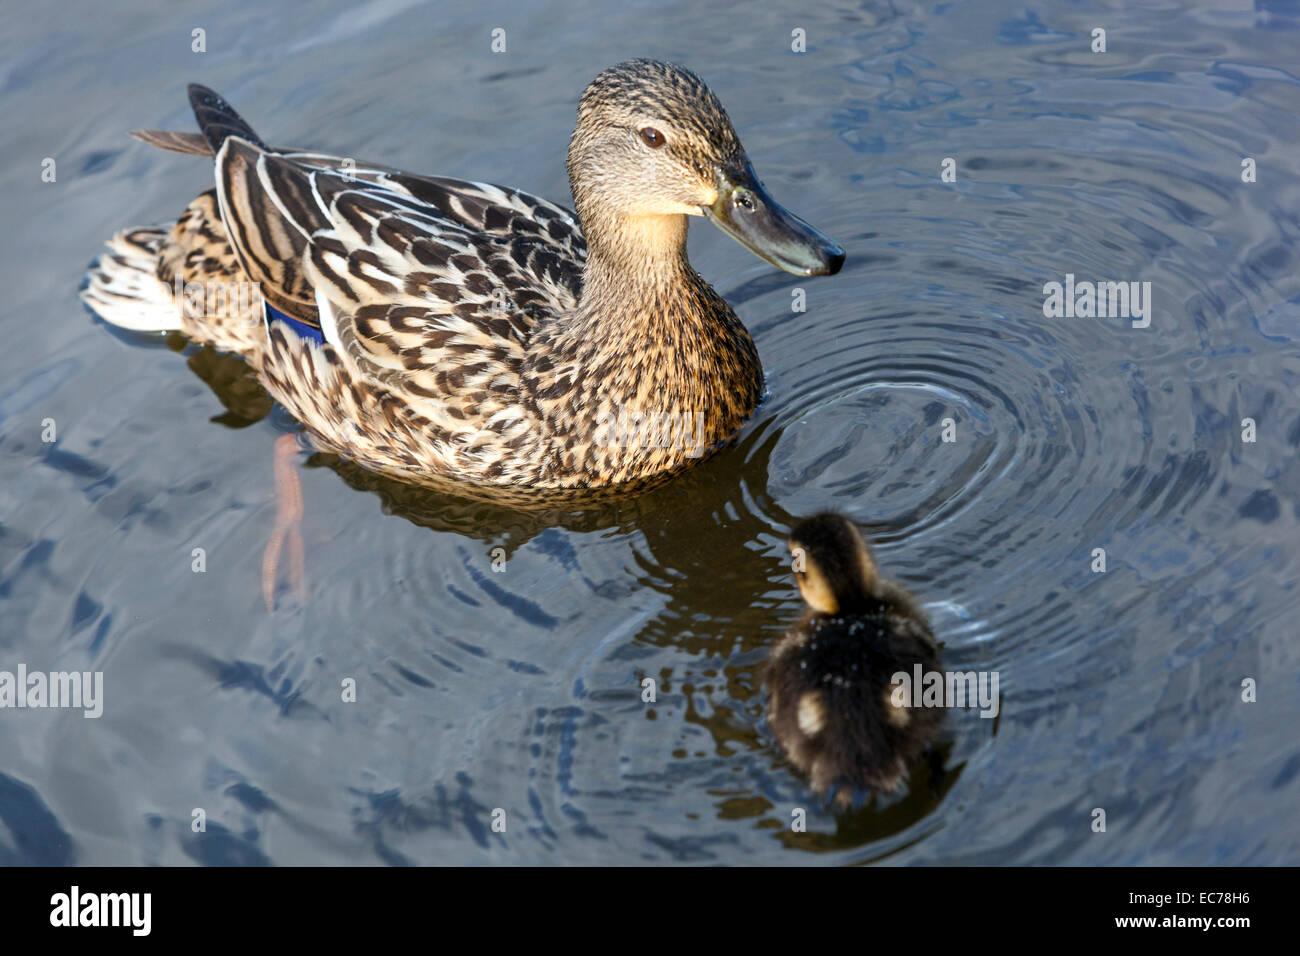 Mallard Ducklings, Anas platyrhynchos - Stock Image